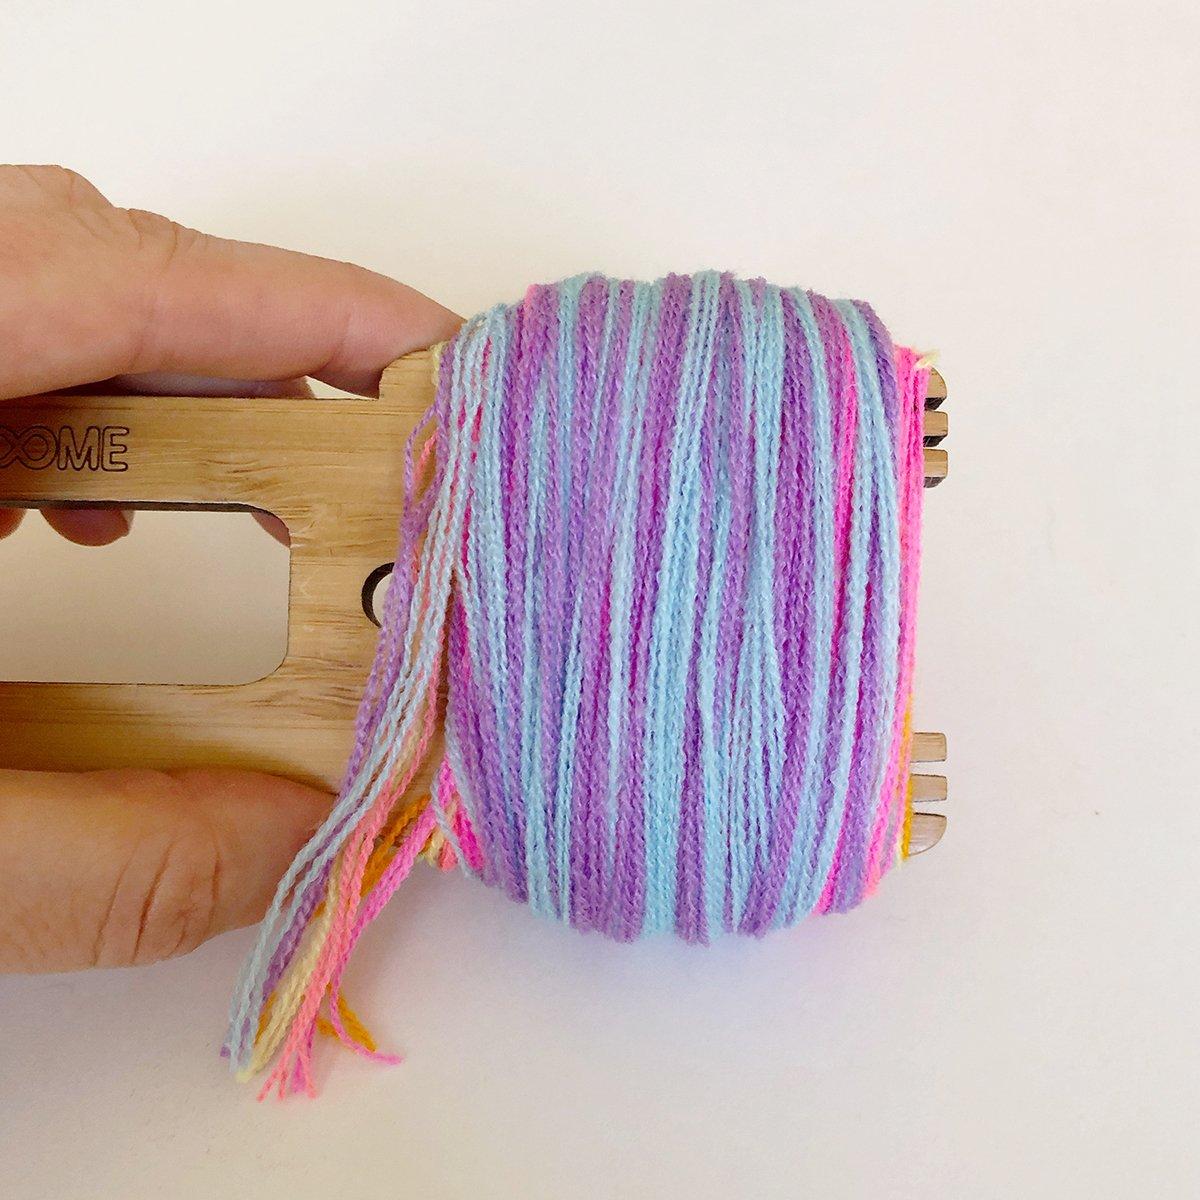 How to Make Tie Dye Pom Poms - The Neon Tea Party